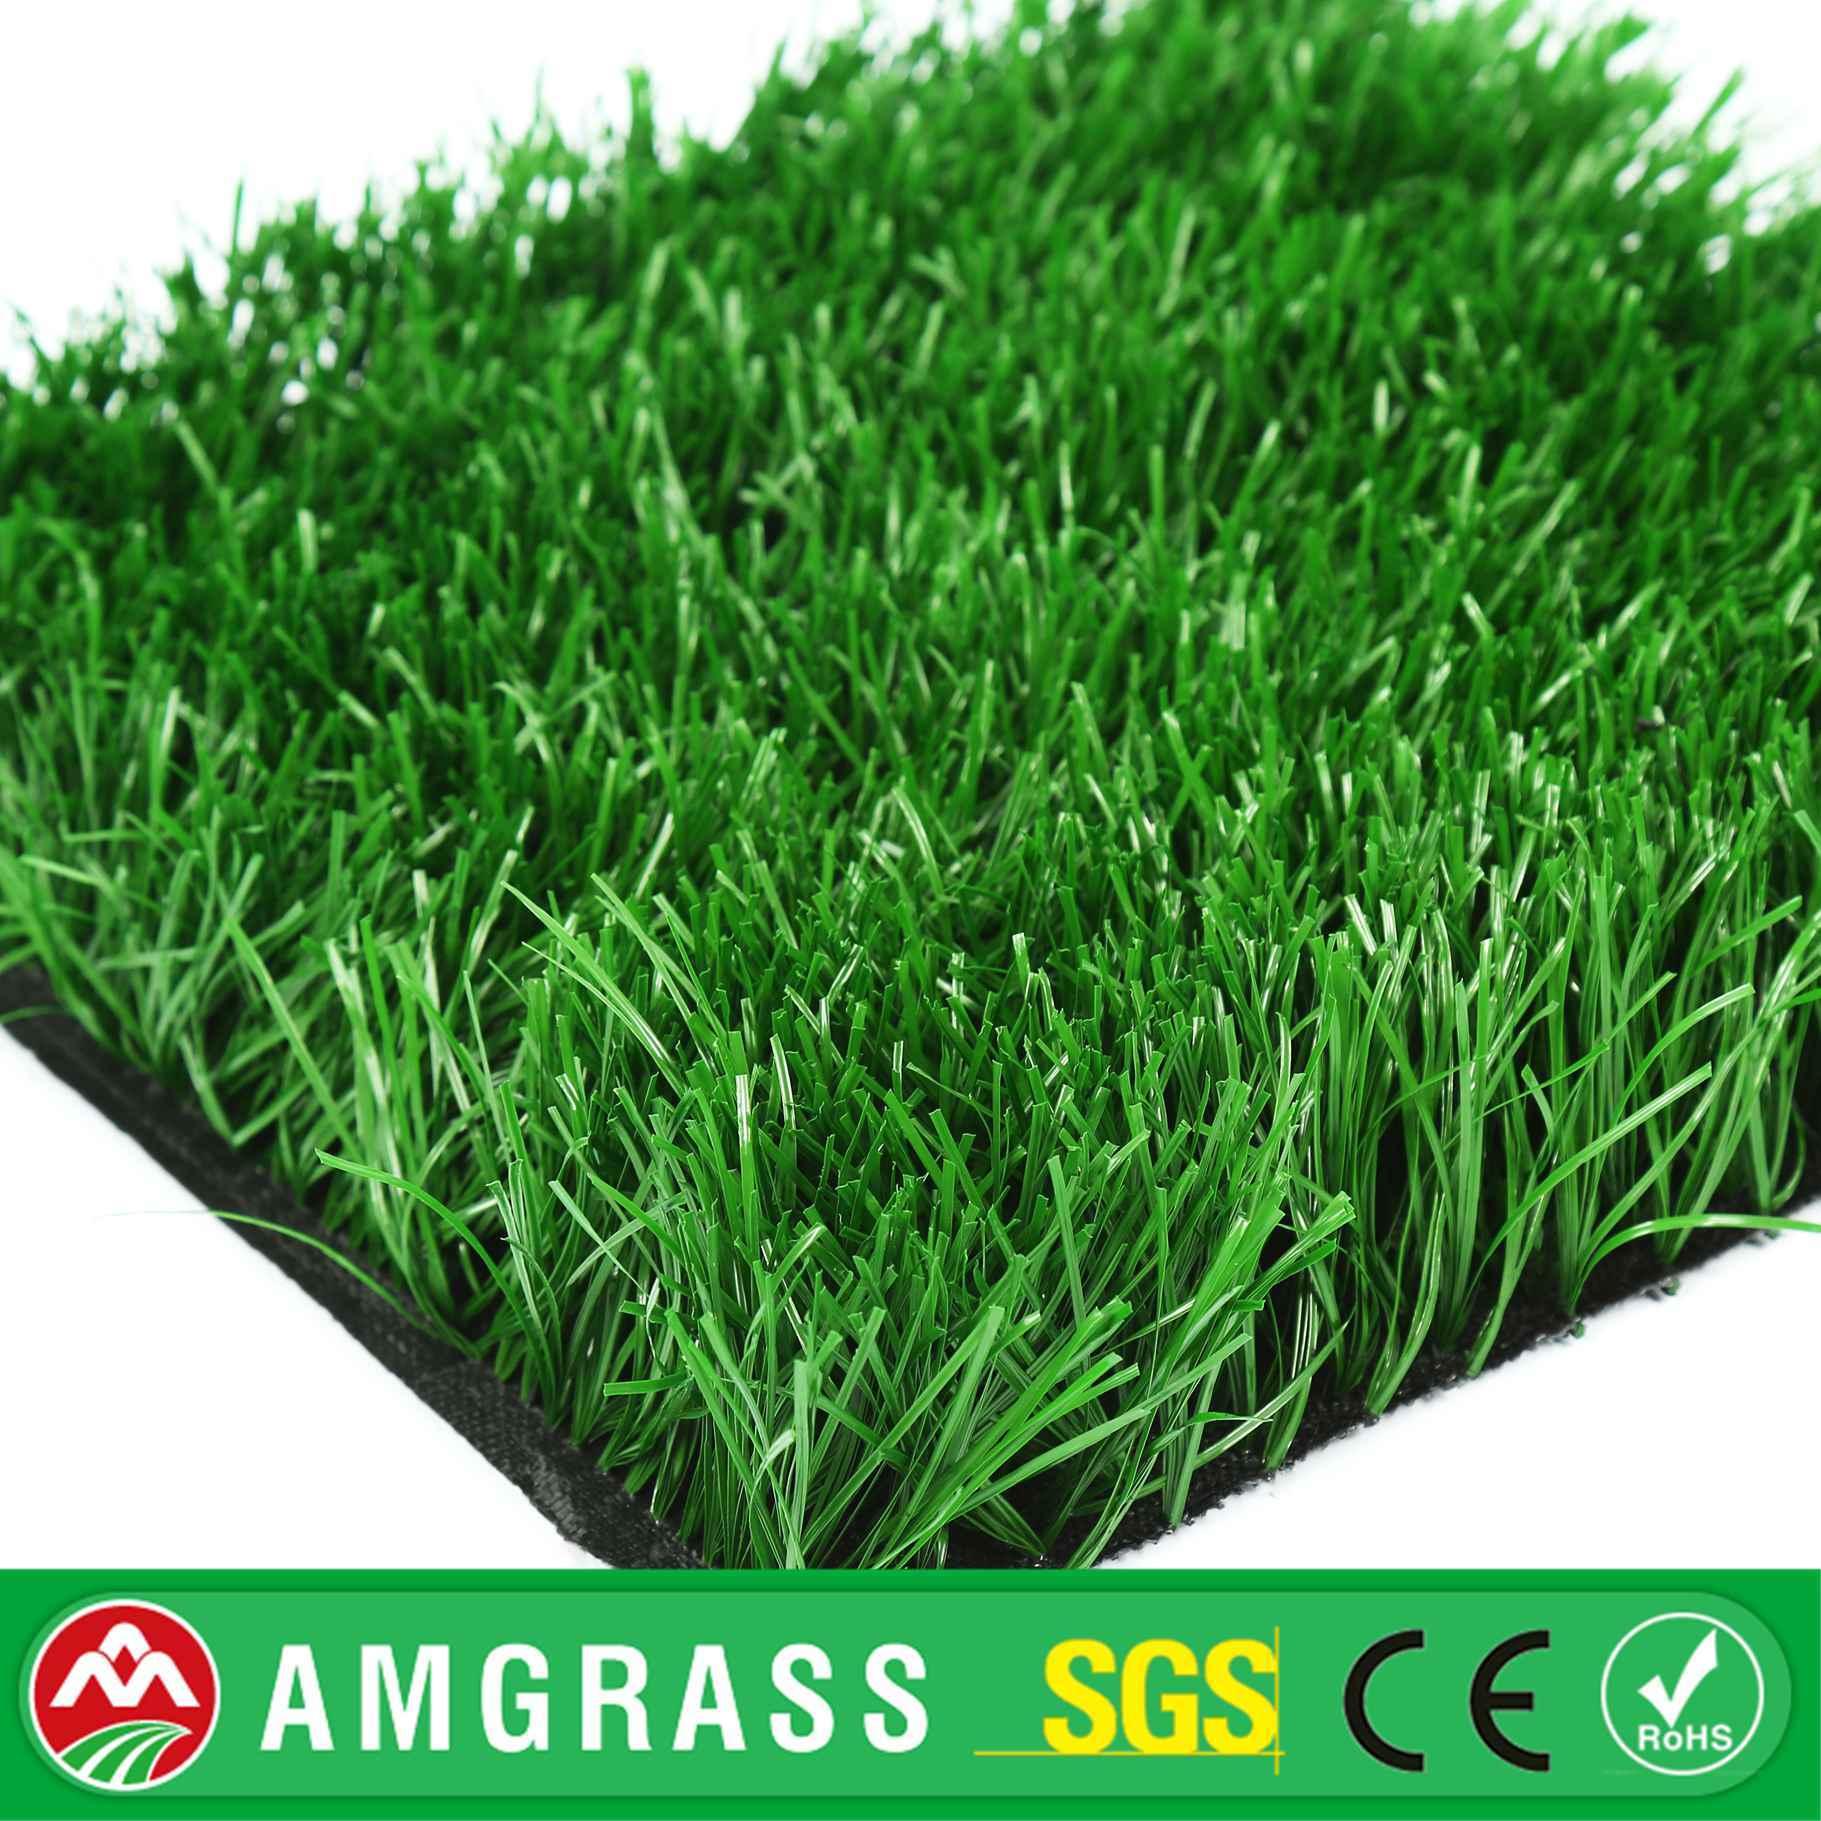 Cost Of Artificial Grass - China 60mm best cost performance football court artificial grass china football grass sports grass